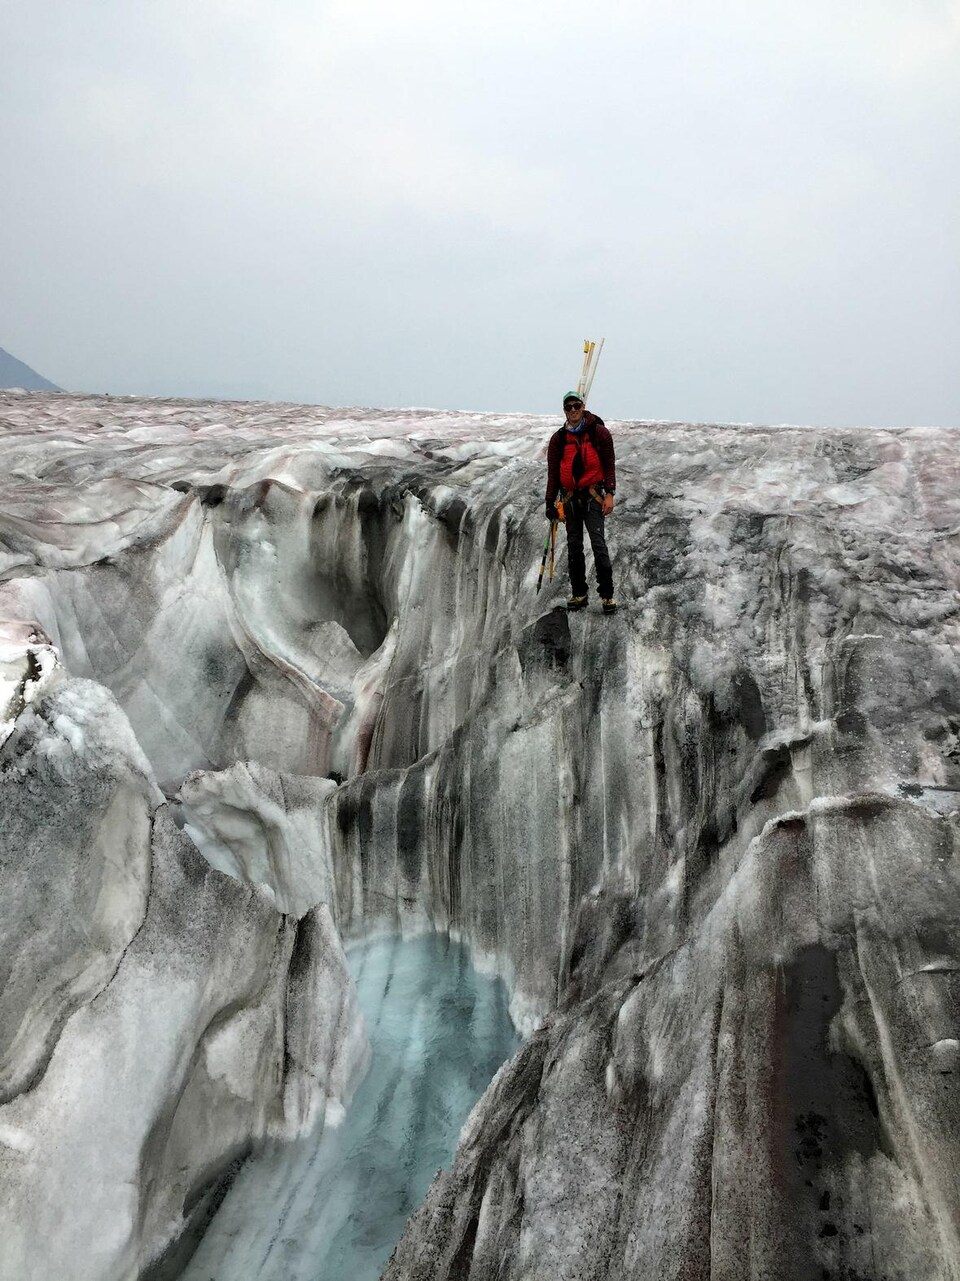 Le scientifique Ben Pelto sur un glacier en Colombie-Britannique.